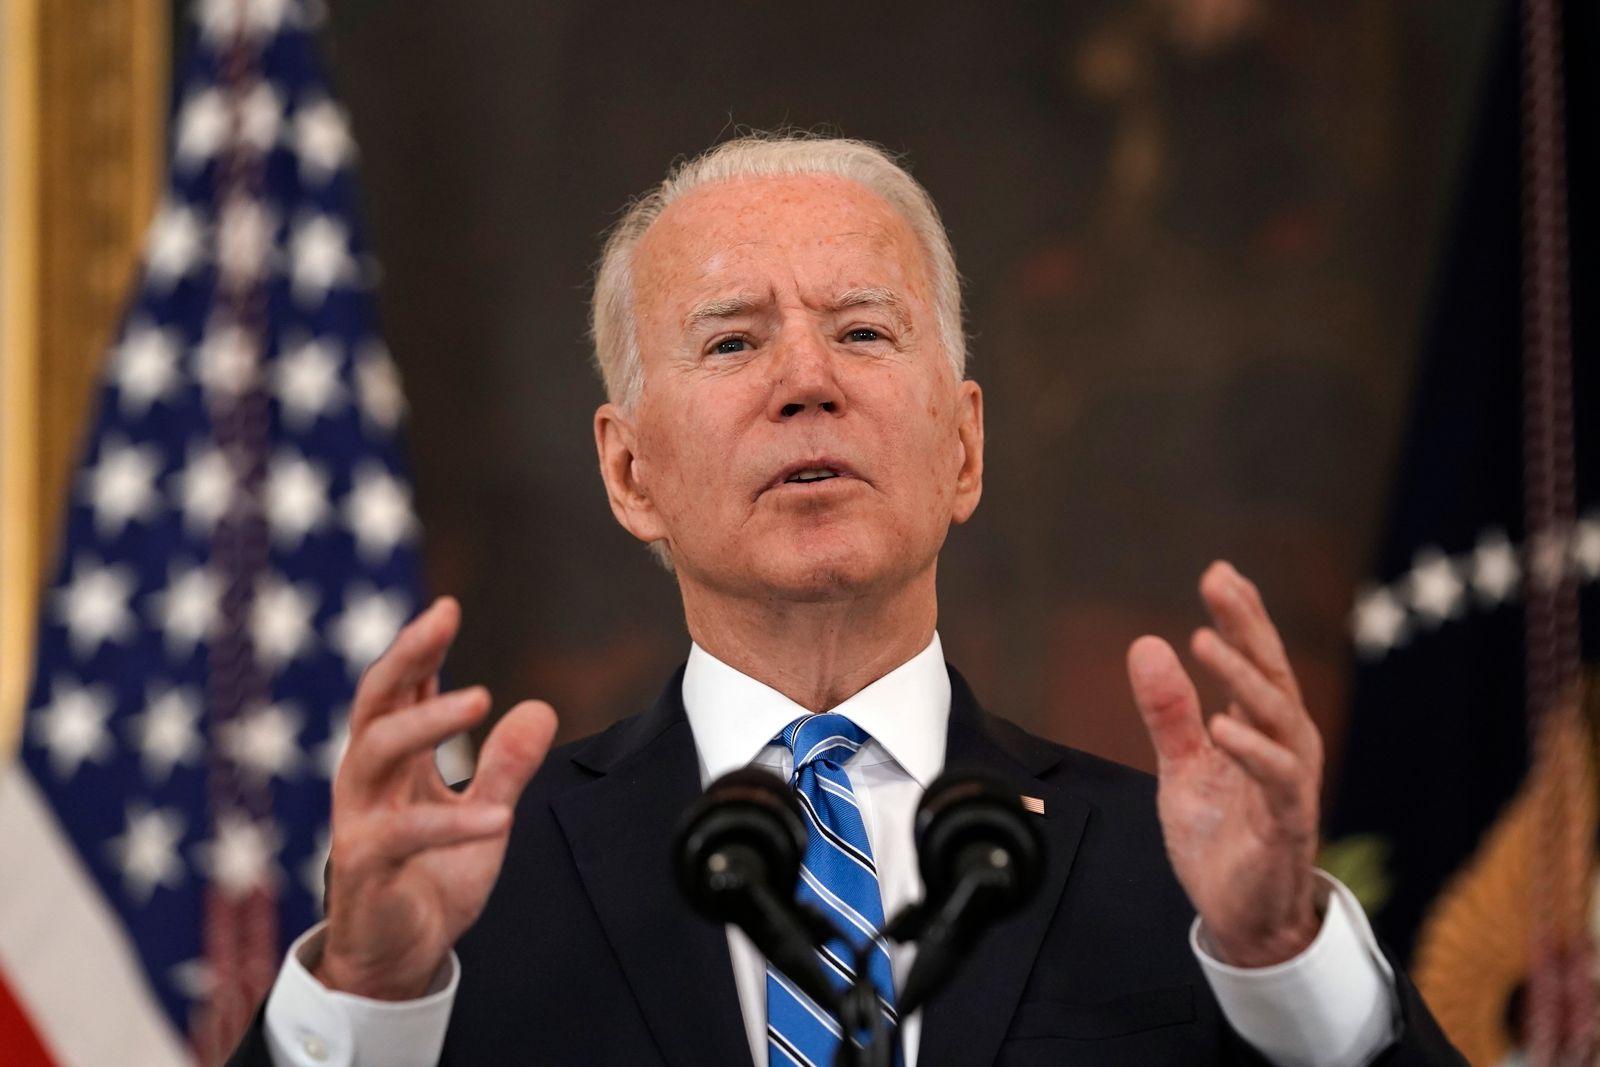 US President Biden delivers remarks on economy